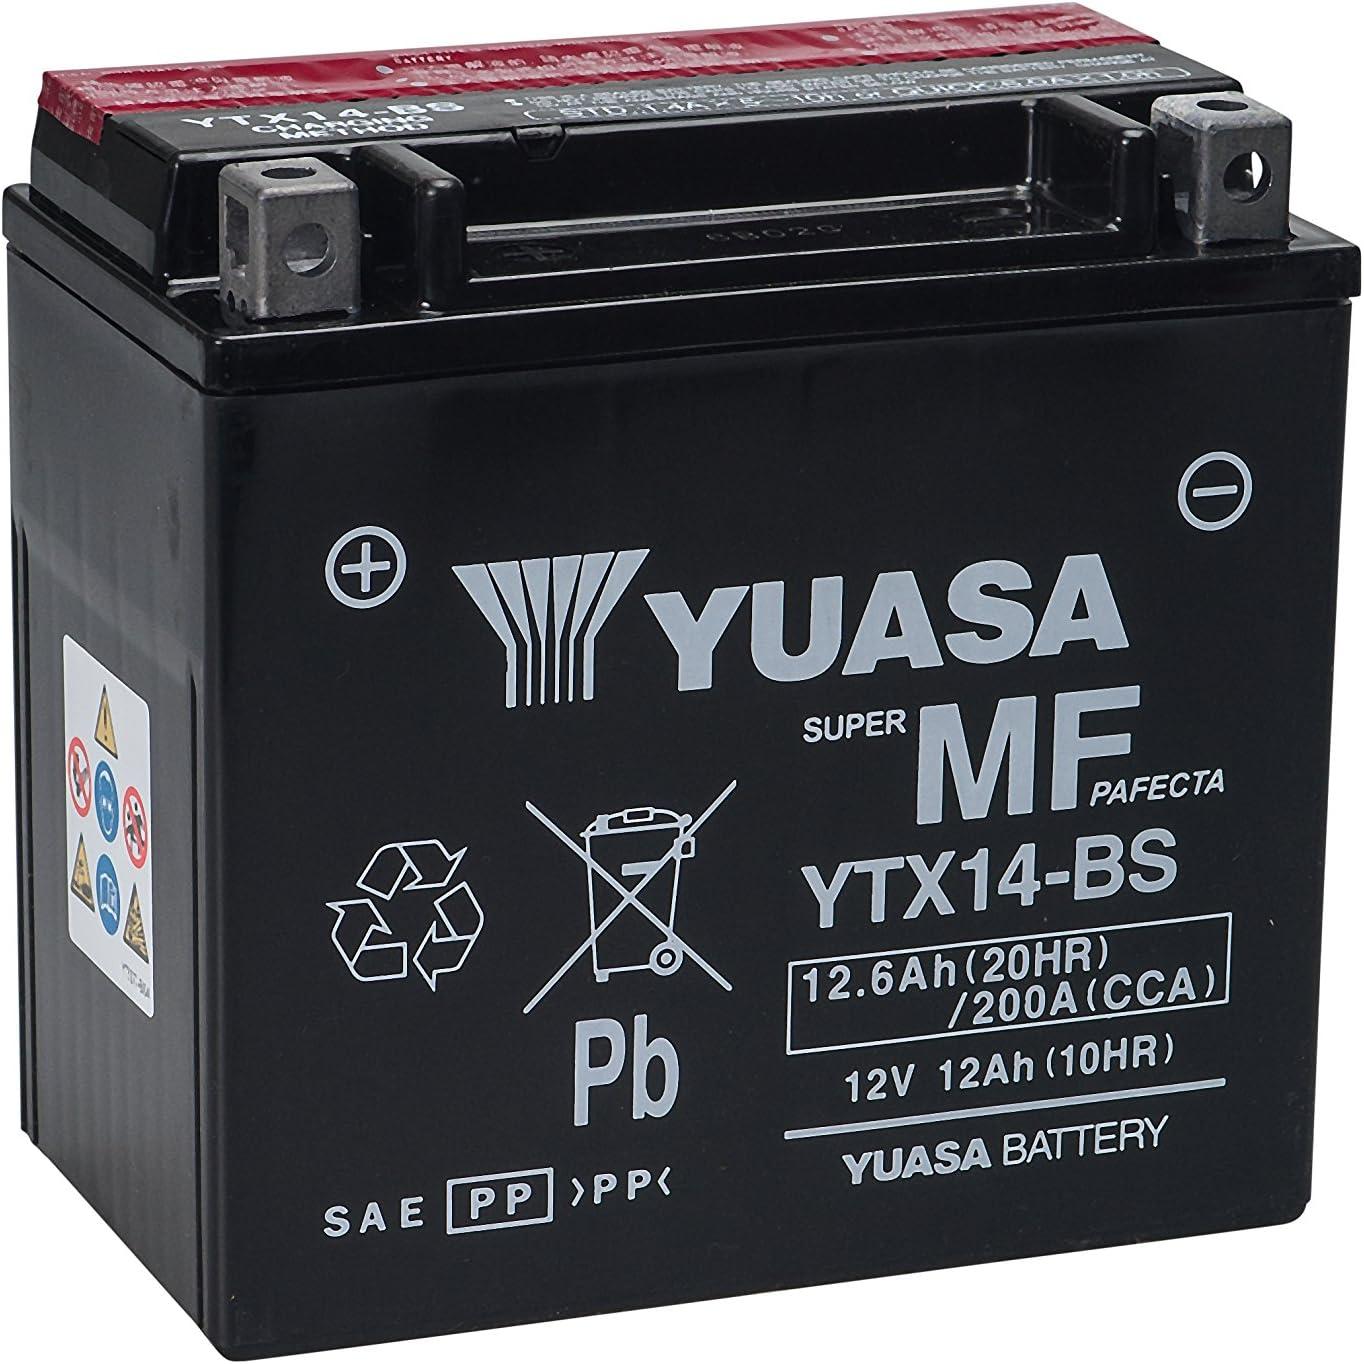 R R 1200 S F 800 ST R inkl. 7,50 Euro Batteriepfand Wartungsfreie Batterie 12V 12AH f/ür Aprilia RSV 1000 K 1300 S GS BMW F 650 GS Buell, K 1200 R